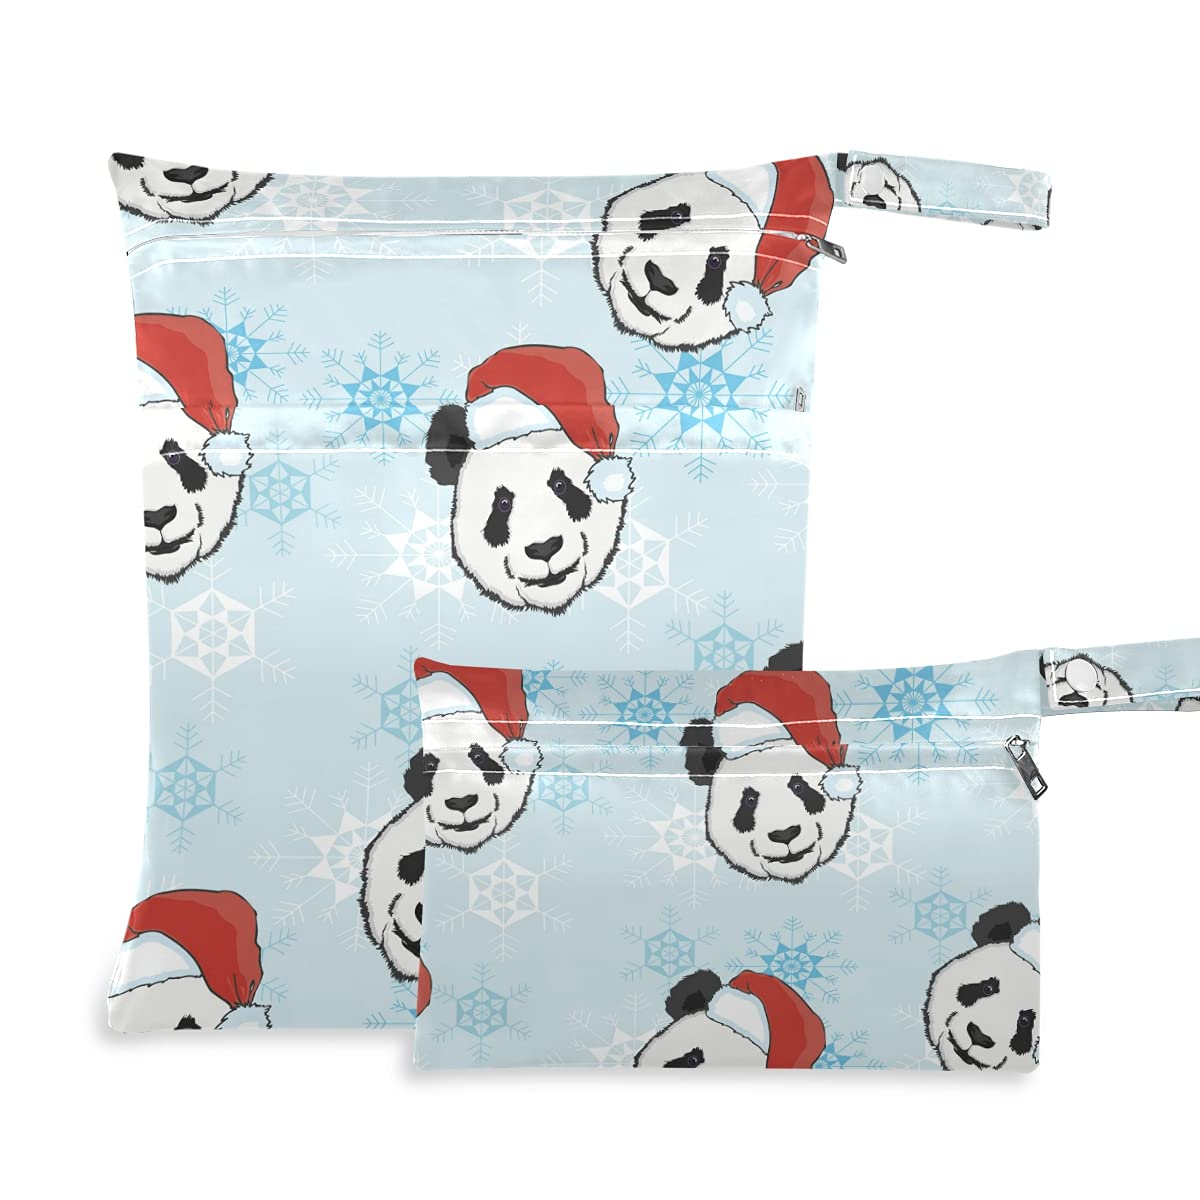 Panda Santa Hat Wet Dry for Great interest Bag Super sale Diaper Reusable Swimsuit